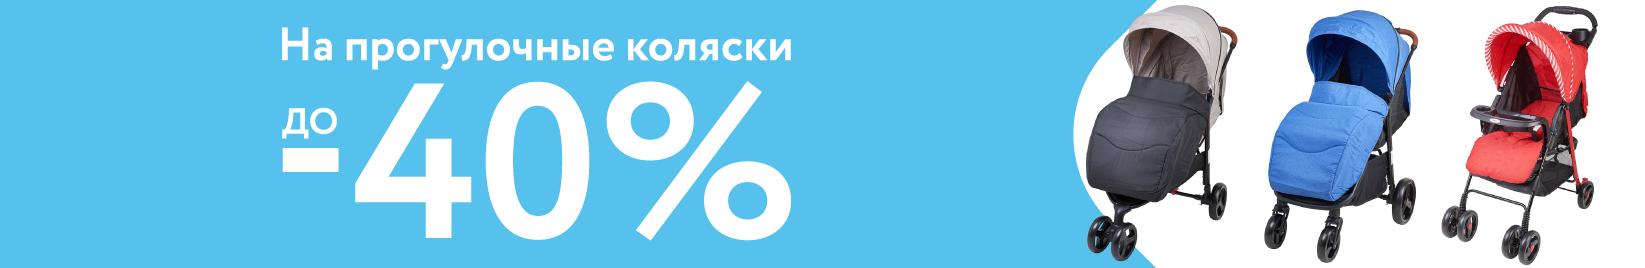 До -40% на прогулочные коляски